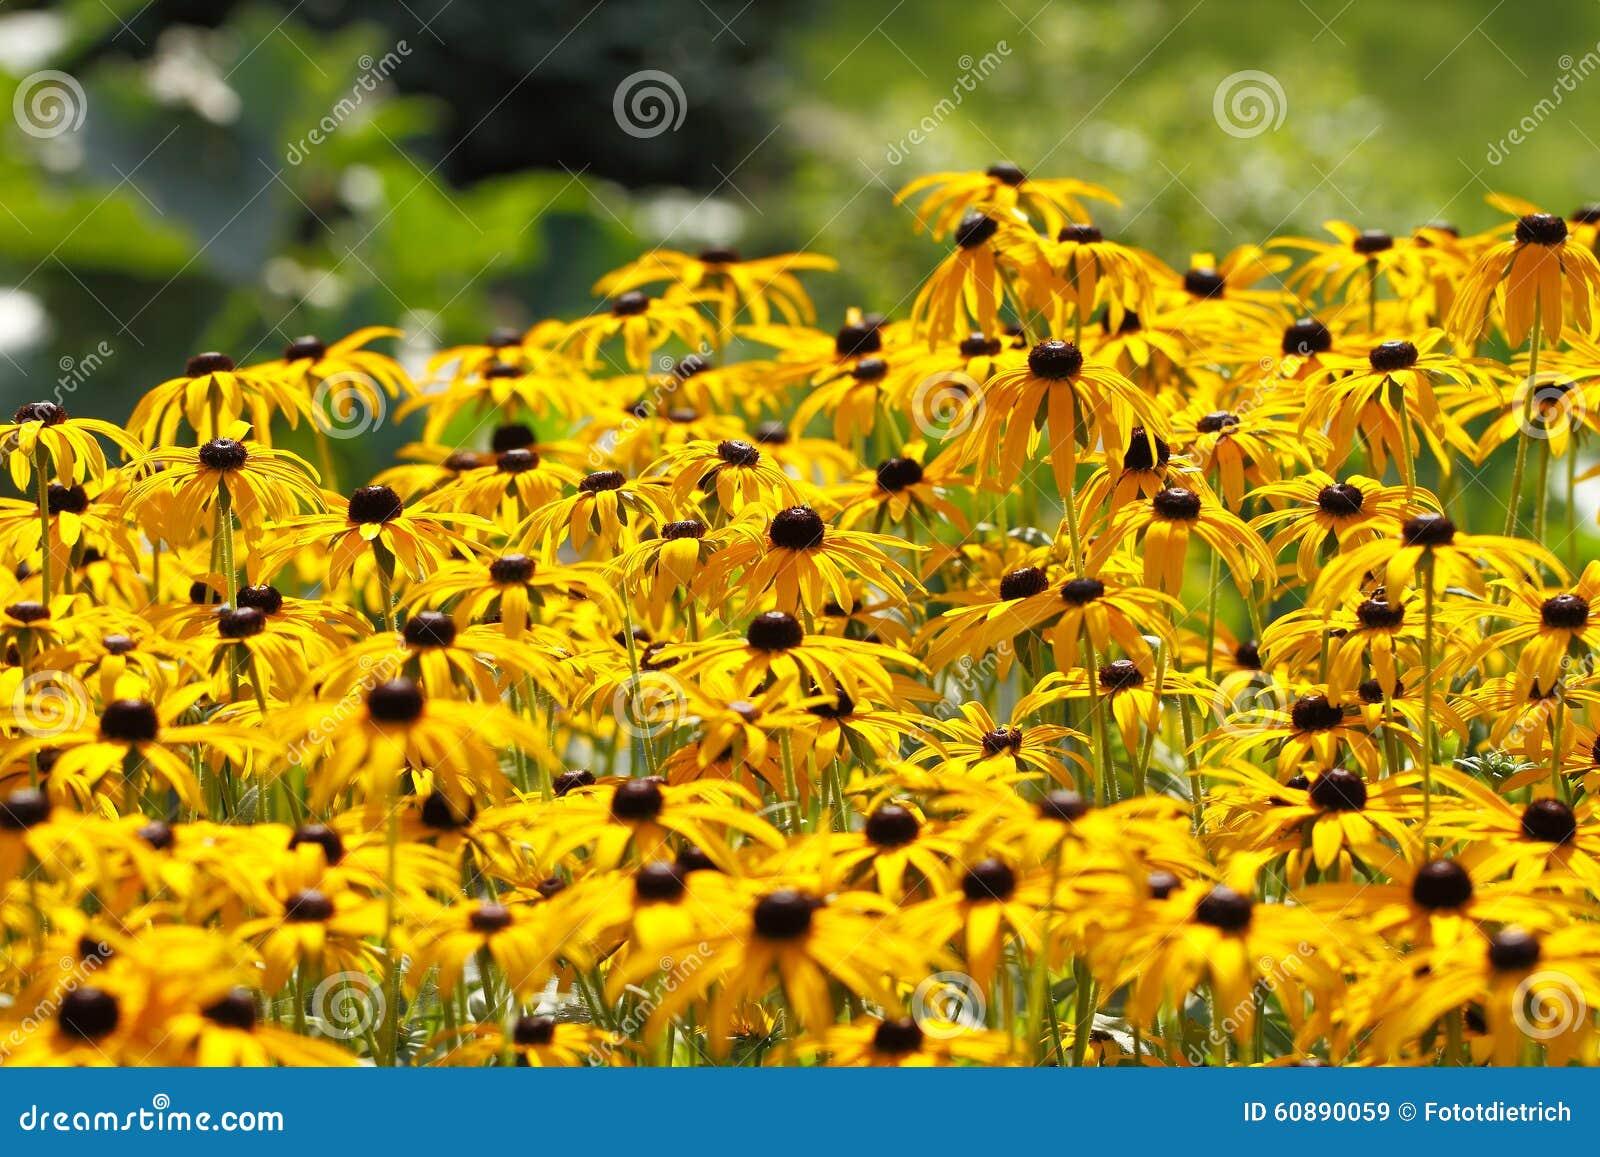 Yellow Cornflower Echinacea Stock Image Image Of Outdoors